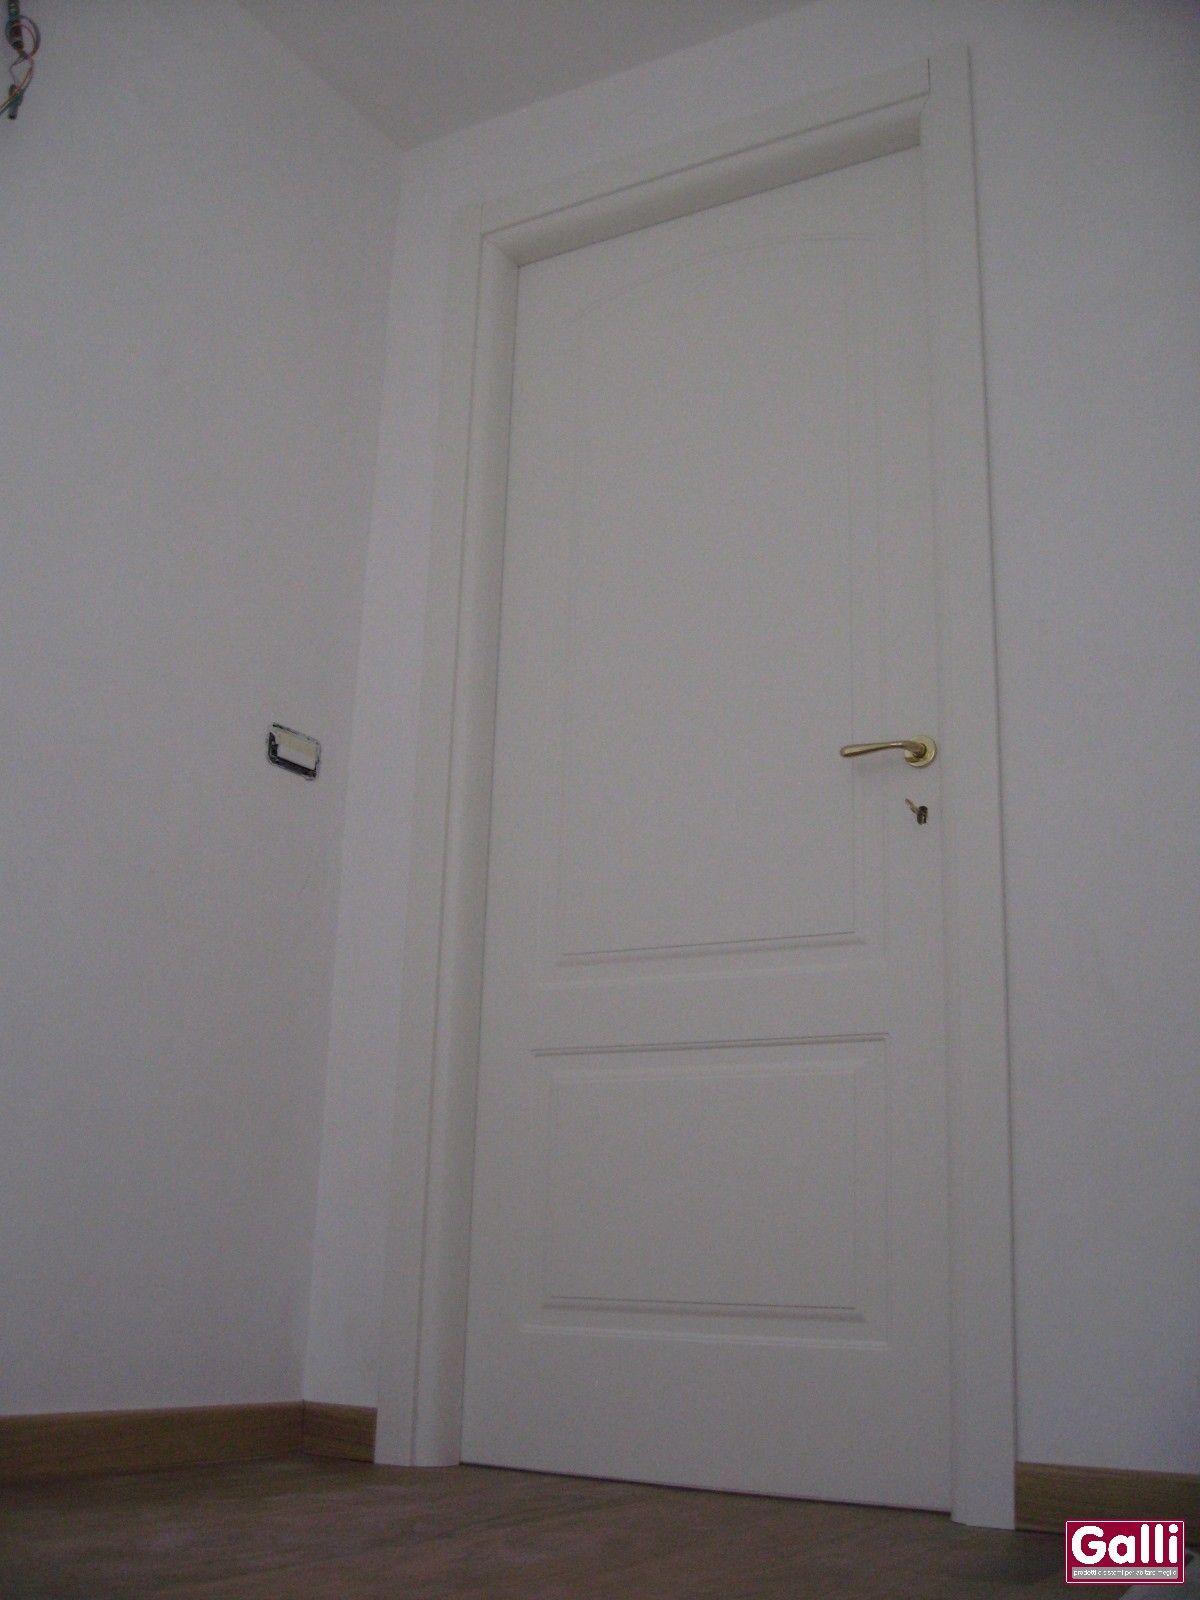 Porte Laccate Bianche Garofoli Prezzi porta #interna #pantografata #bianca #laccata #ferrerolegno